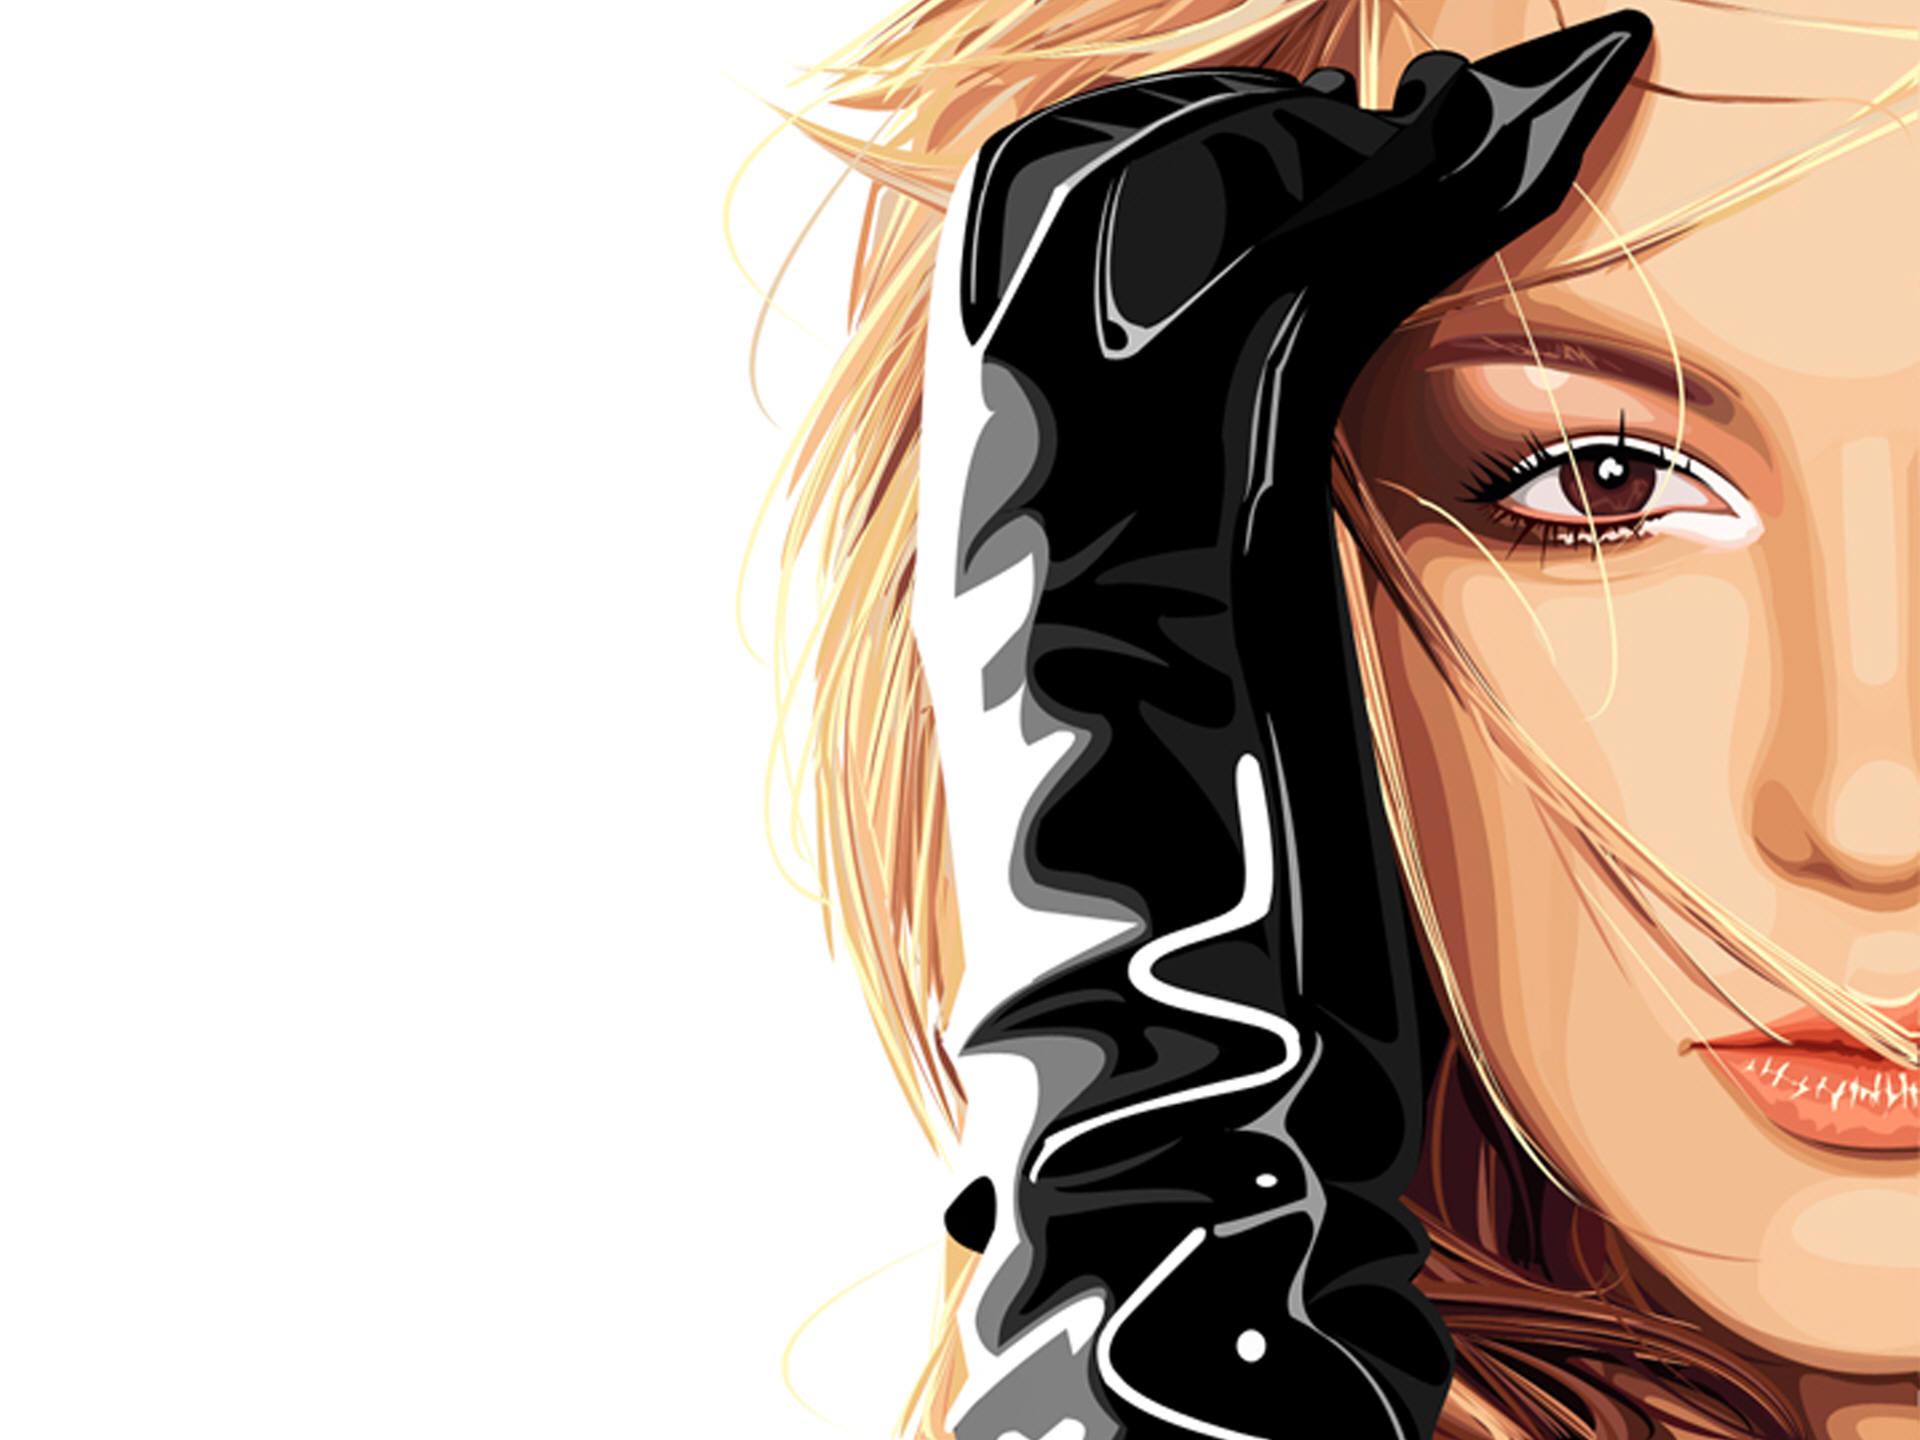 Britney Spears Wallpaper 39